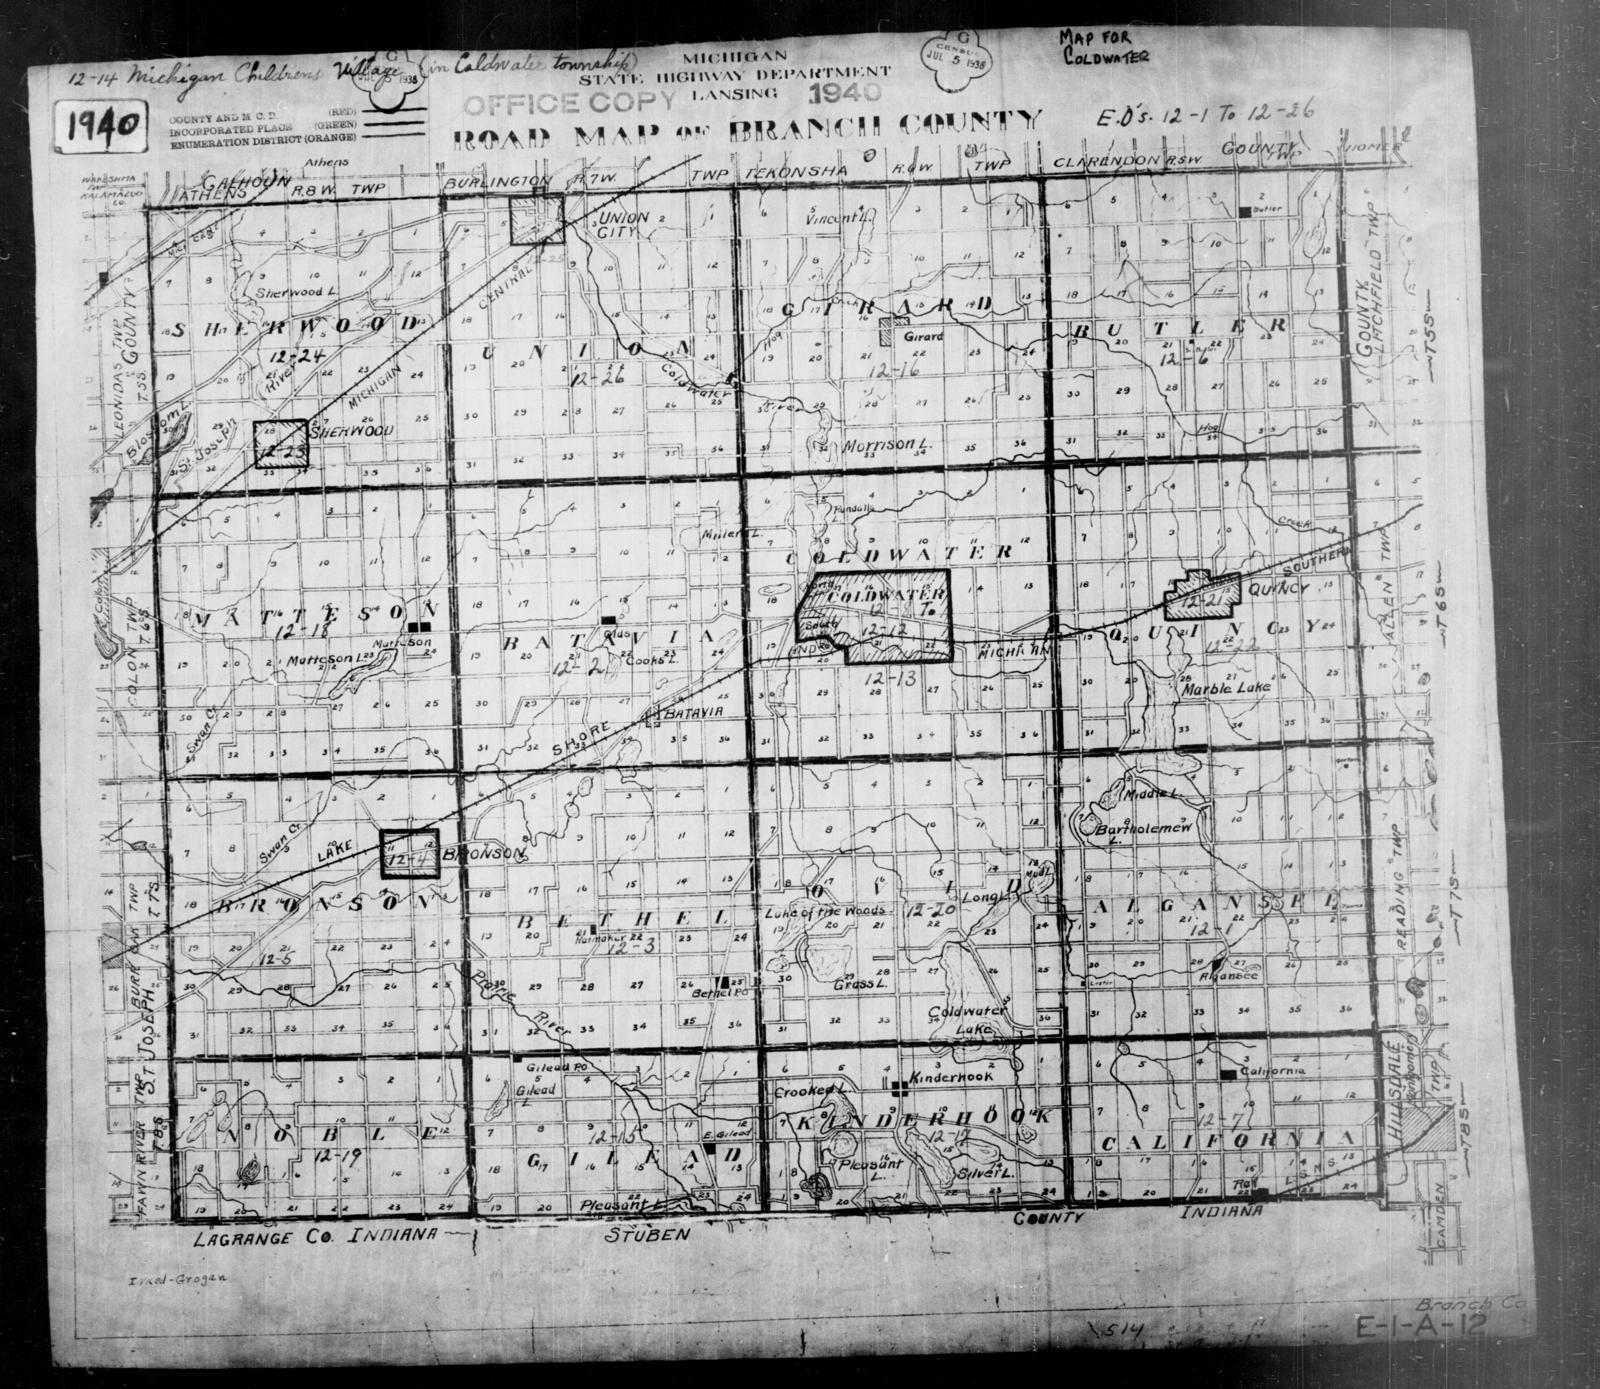 1940 Census Enumeration District Maps Michigan Branch County